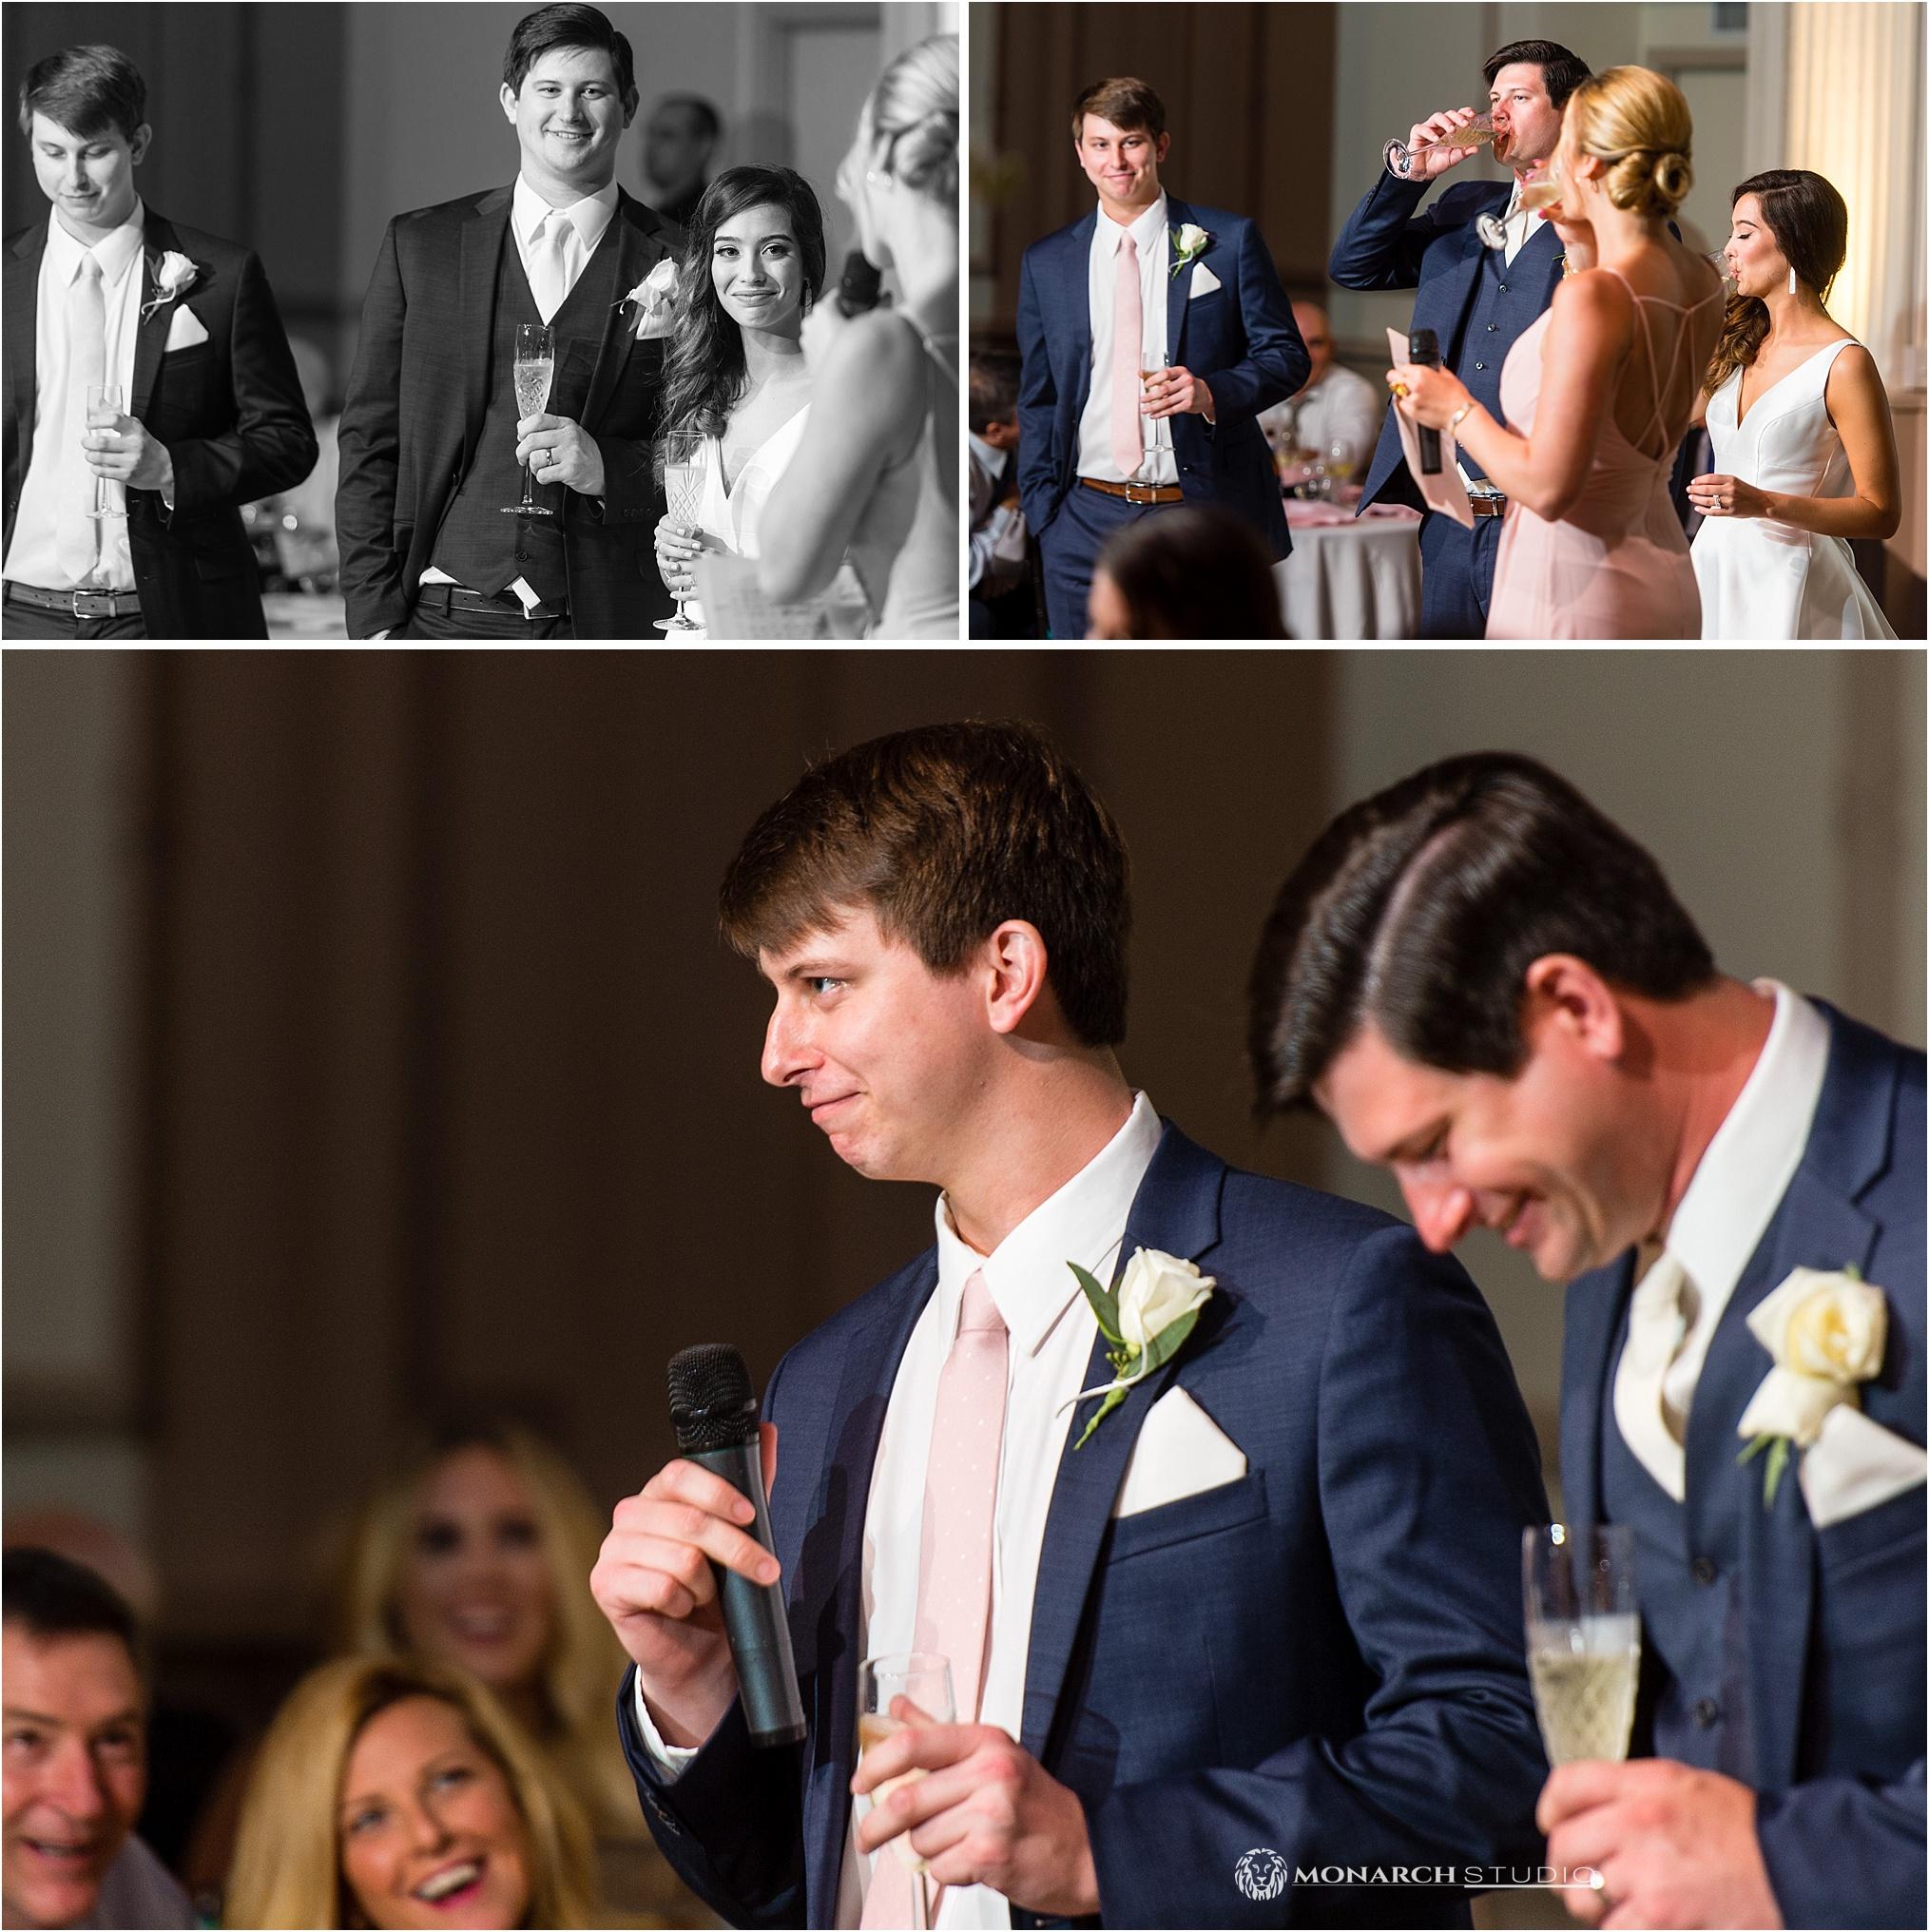 st-augustine-wedding-photographer-121.jpg